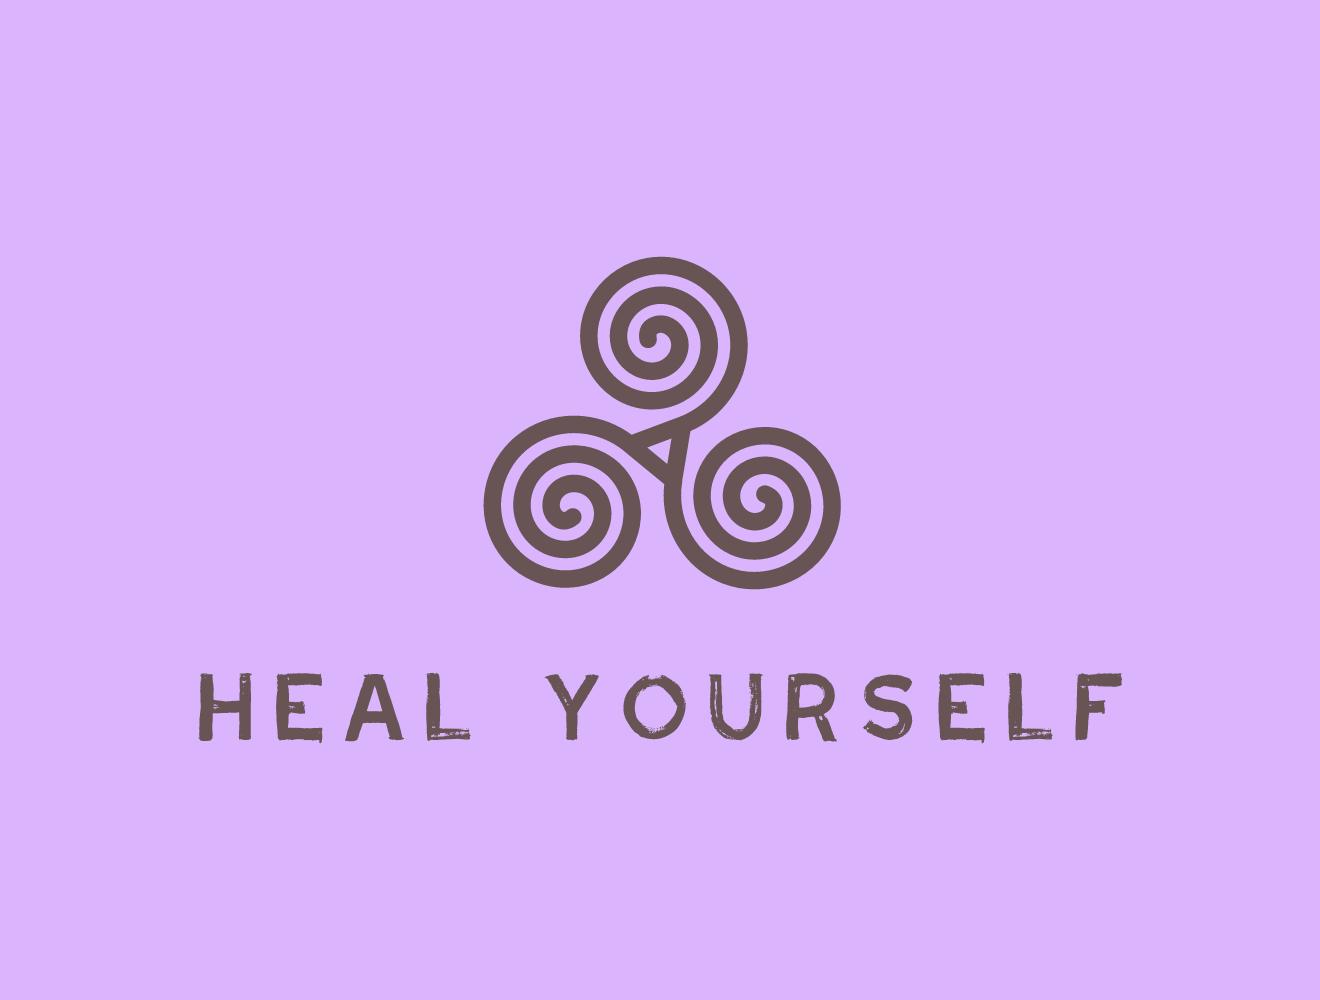 SELF LOVE AND SOUL HEALING